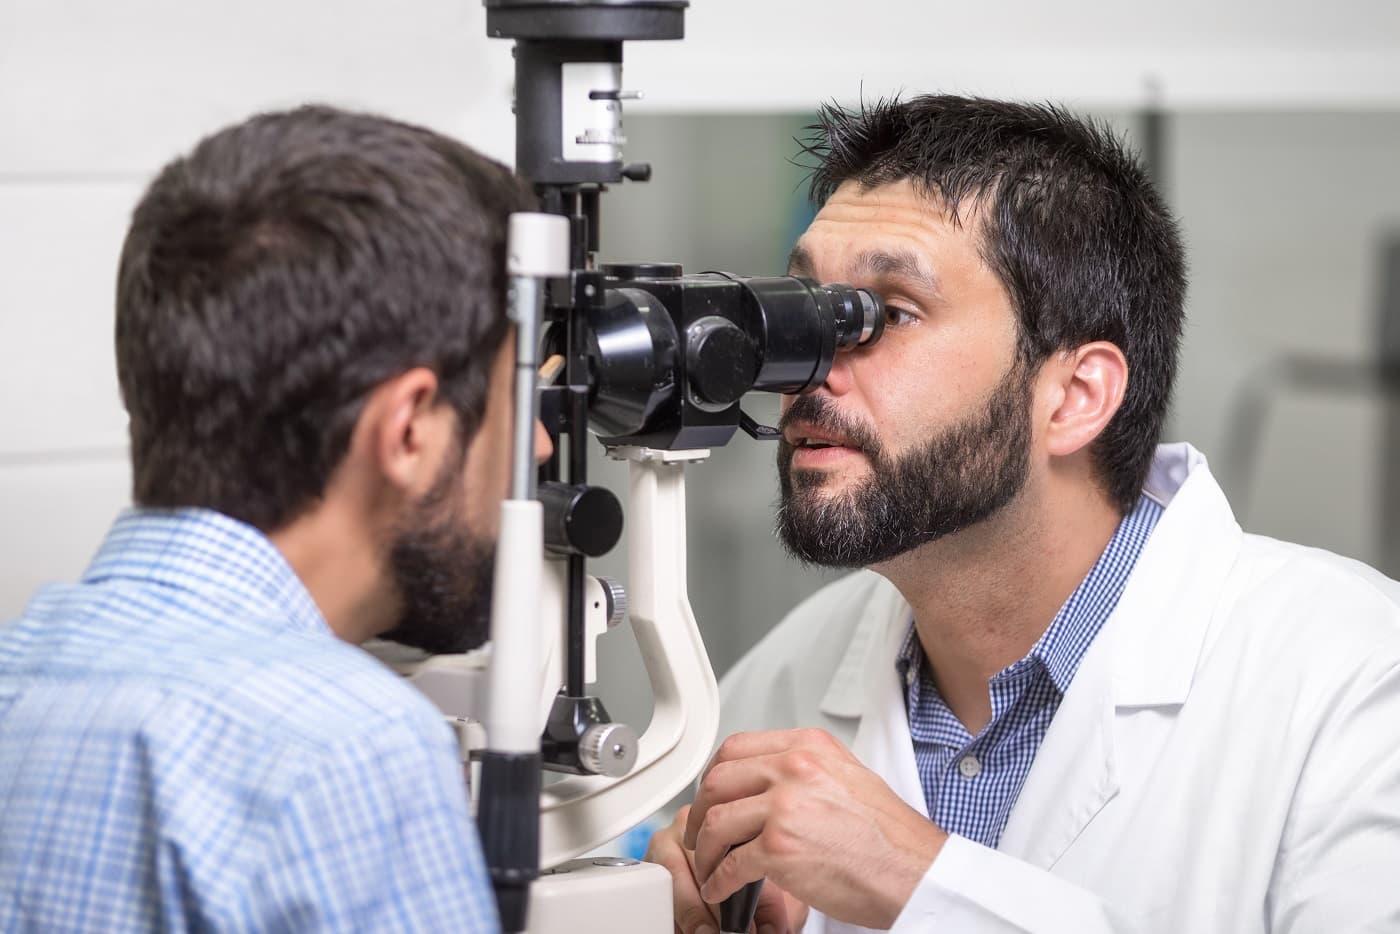 Protección de datos para ópticas imagen clínica